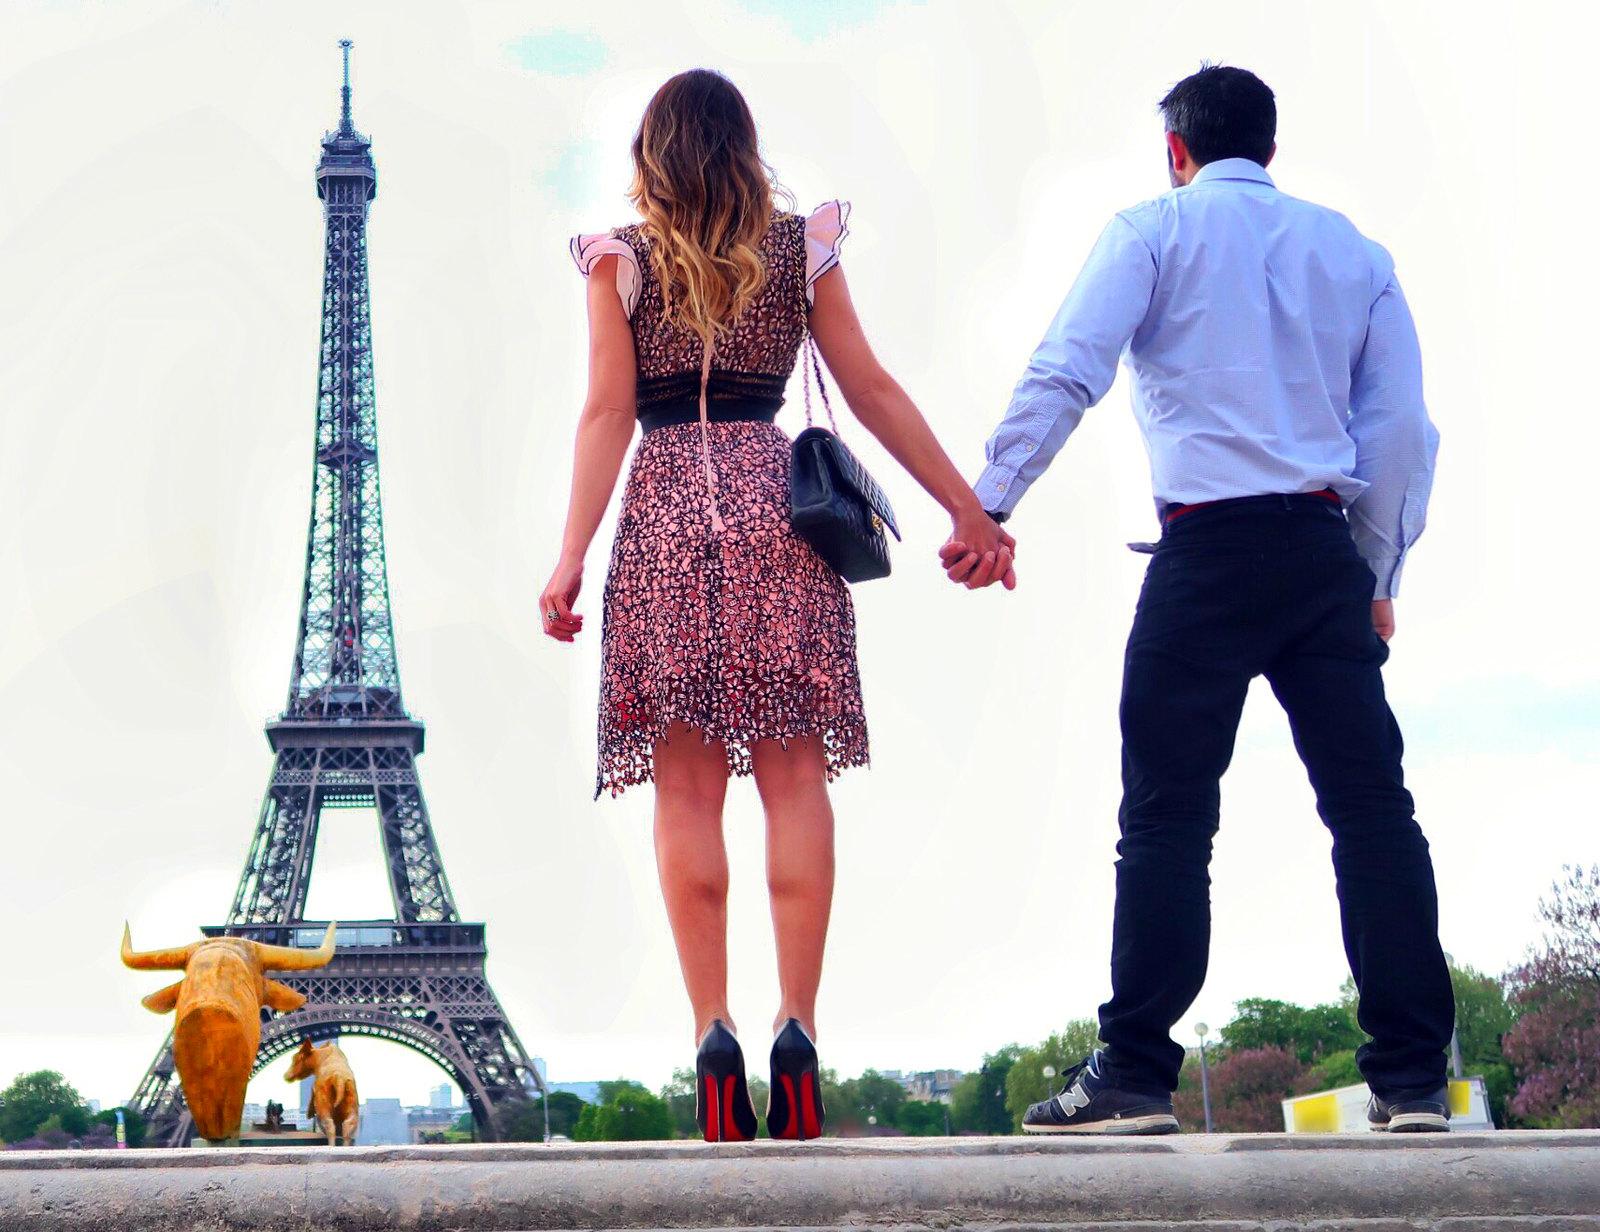 Viajar a Paris con Perro viajar a paris con perro - 34559997096 14806963b0 h - Viajar a Paris con perro